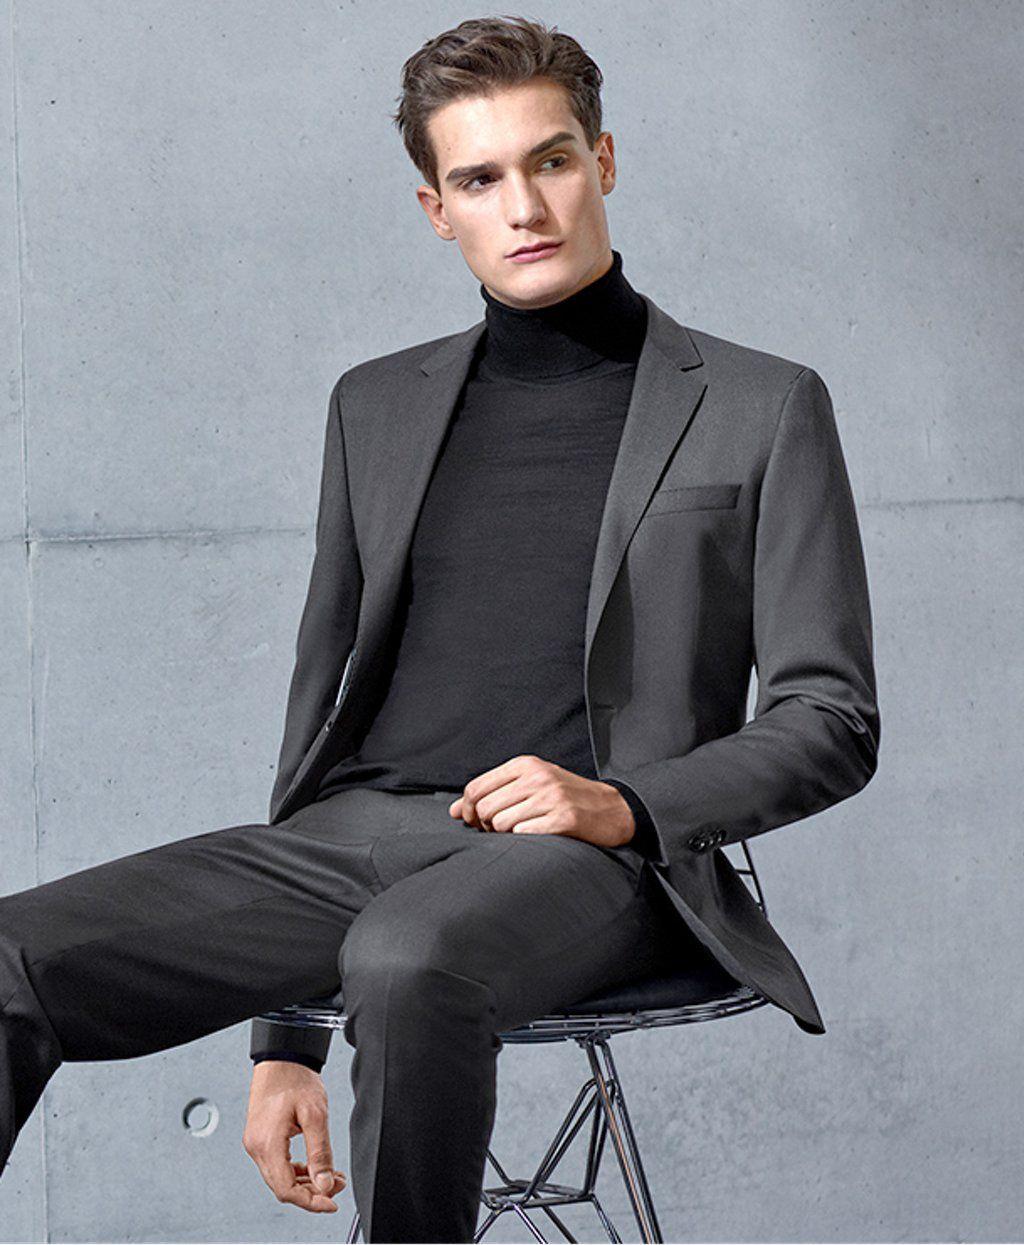 HUGO BOSS-MODEL MEN MAN MALE IN SUITS | TOMMY DUNN | Pinterest ...